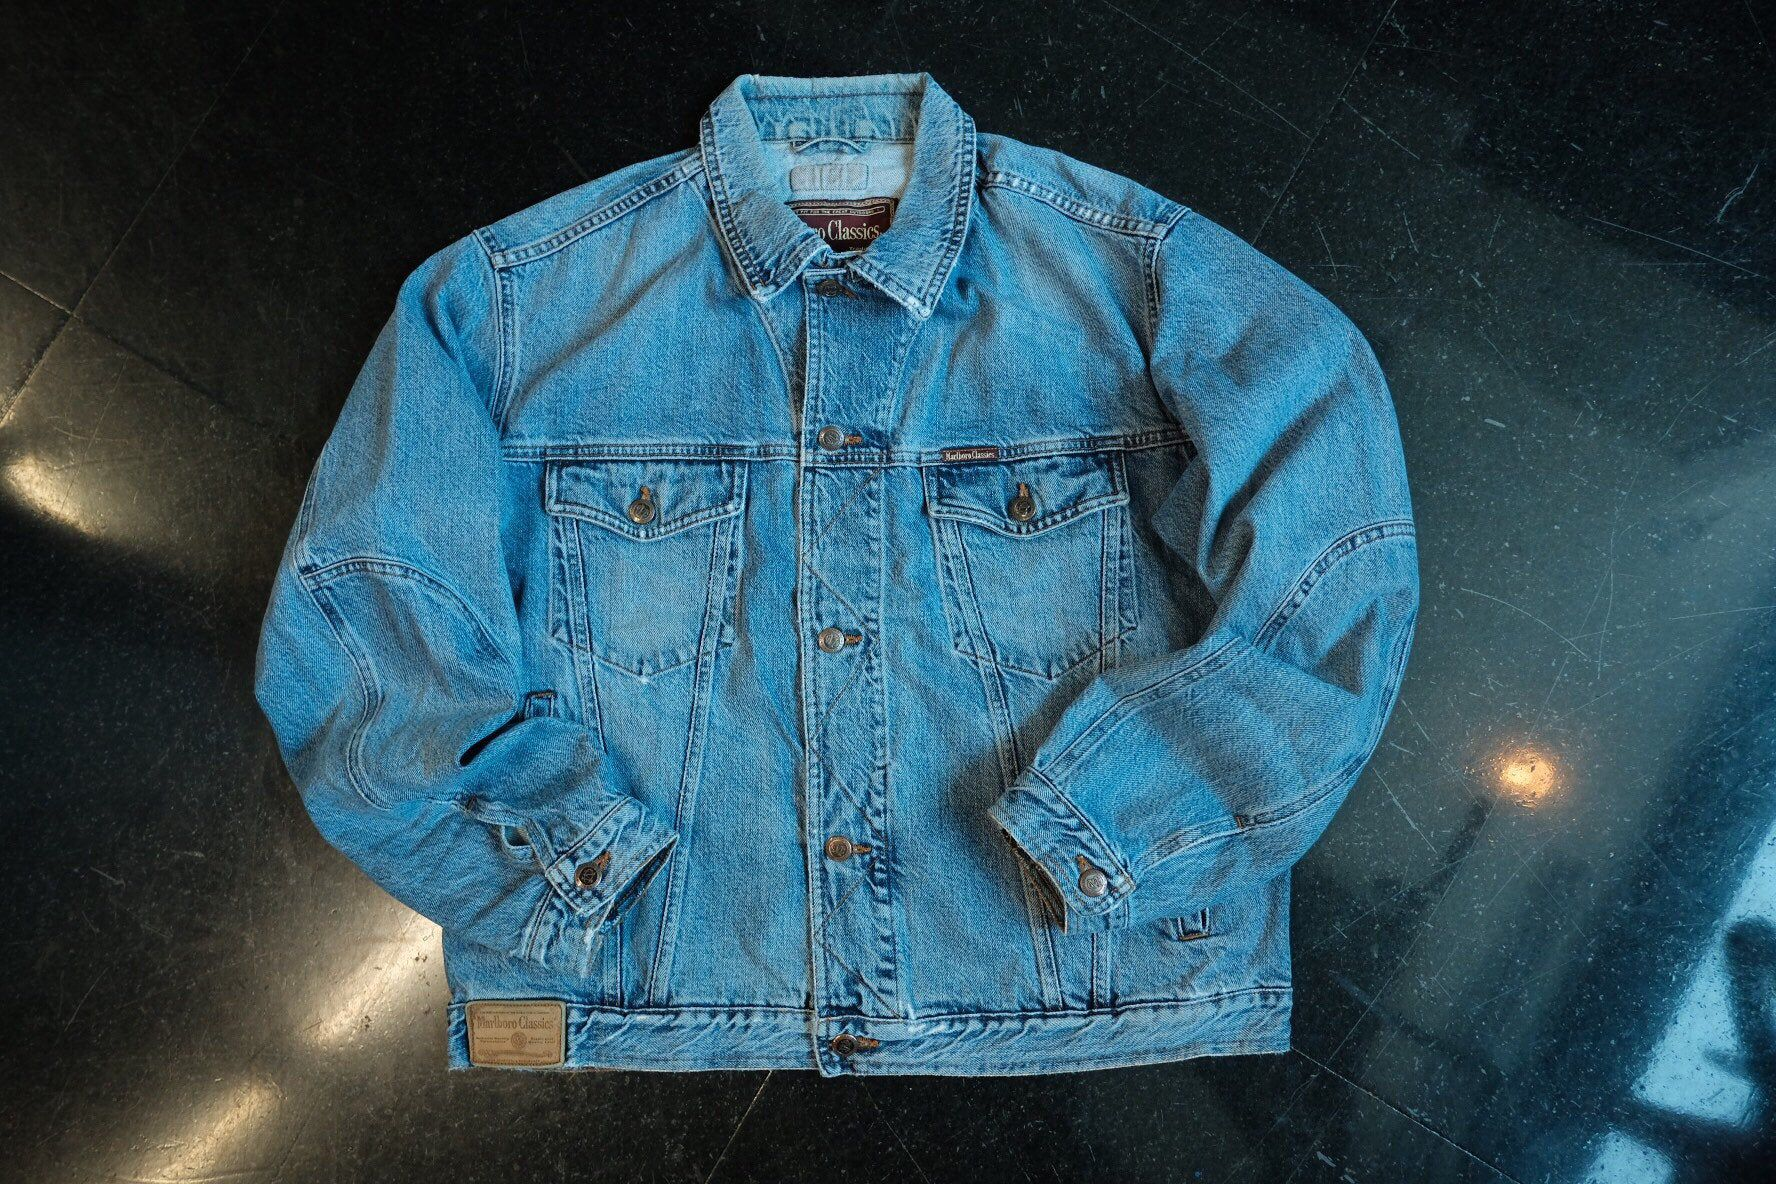 Marlboro Classics Denim Jacket 90s Vintage Workwear Size M In 2020 Denim Jacket Marlboro Classics Jackets